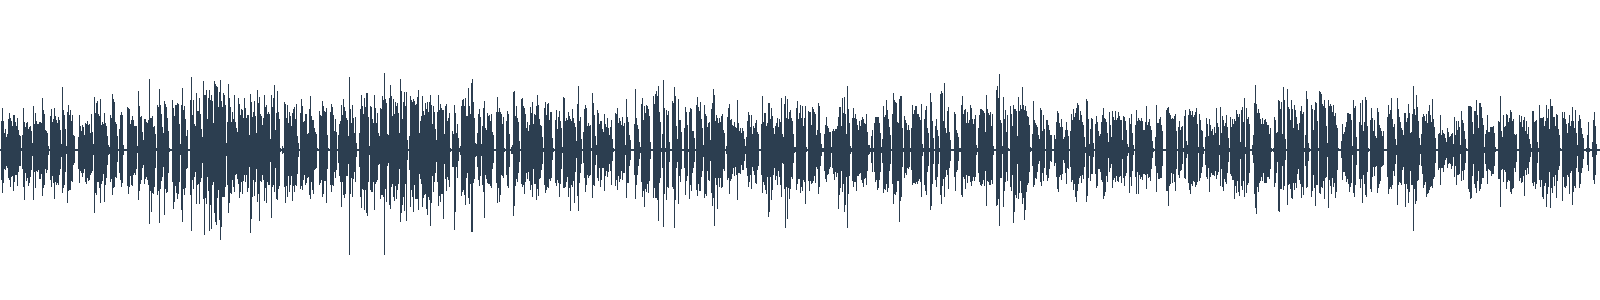 Tajomný mlyn v Karpatoch waveform